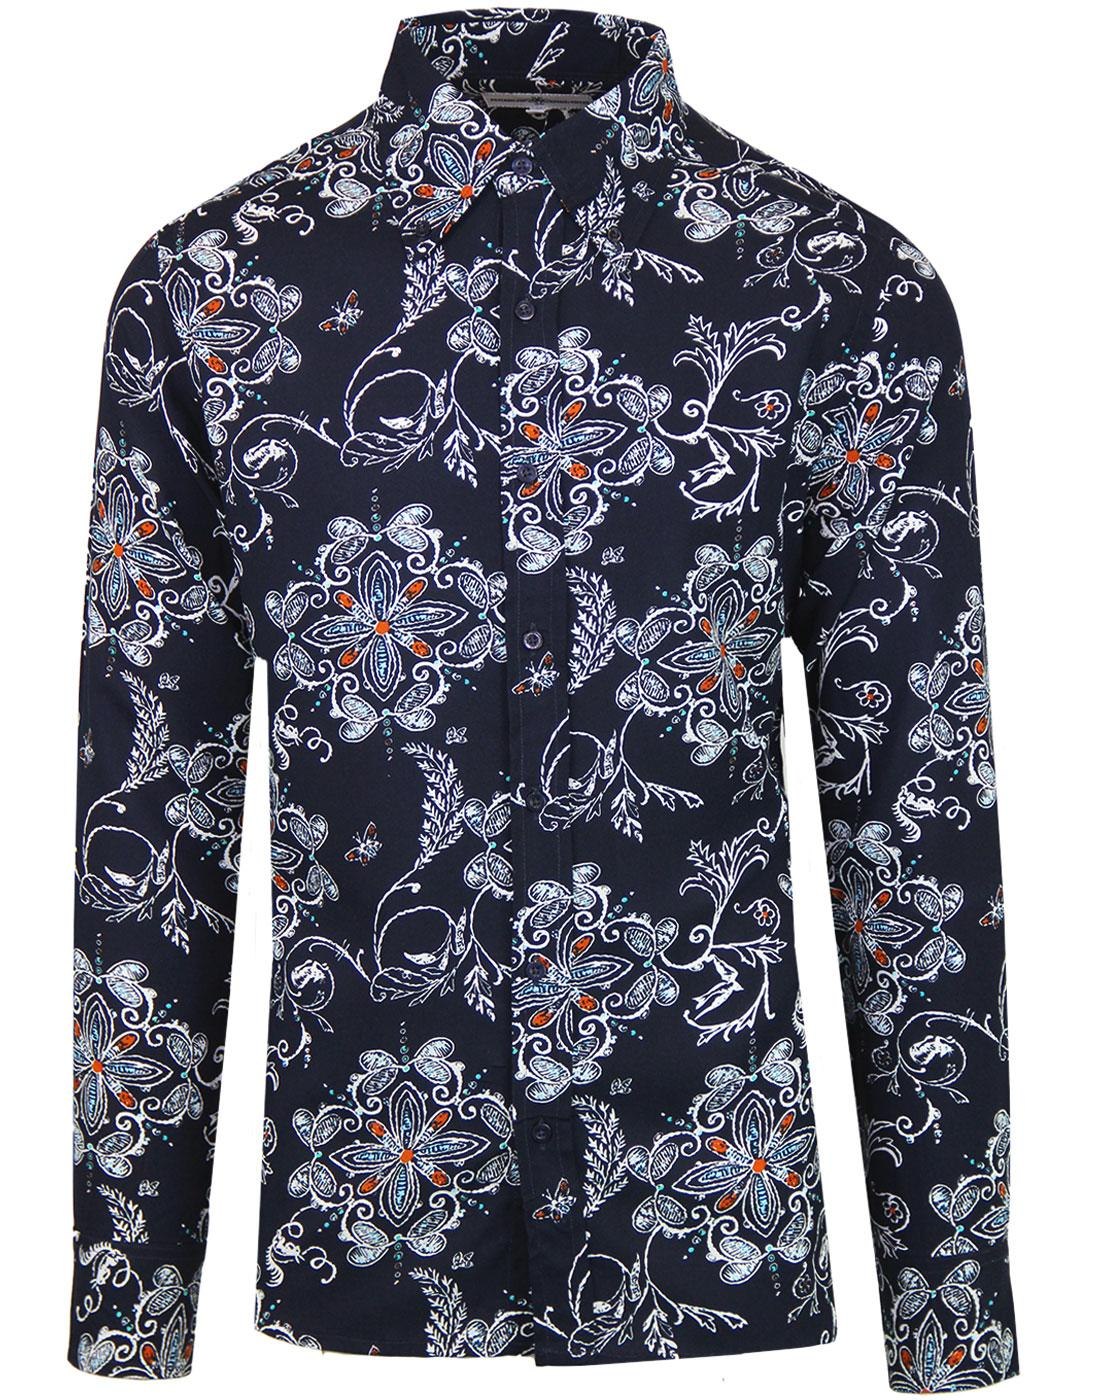 Garageflower MADCAP ENGLAND Mod Rayon Floral Shirt